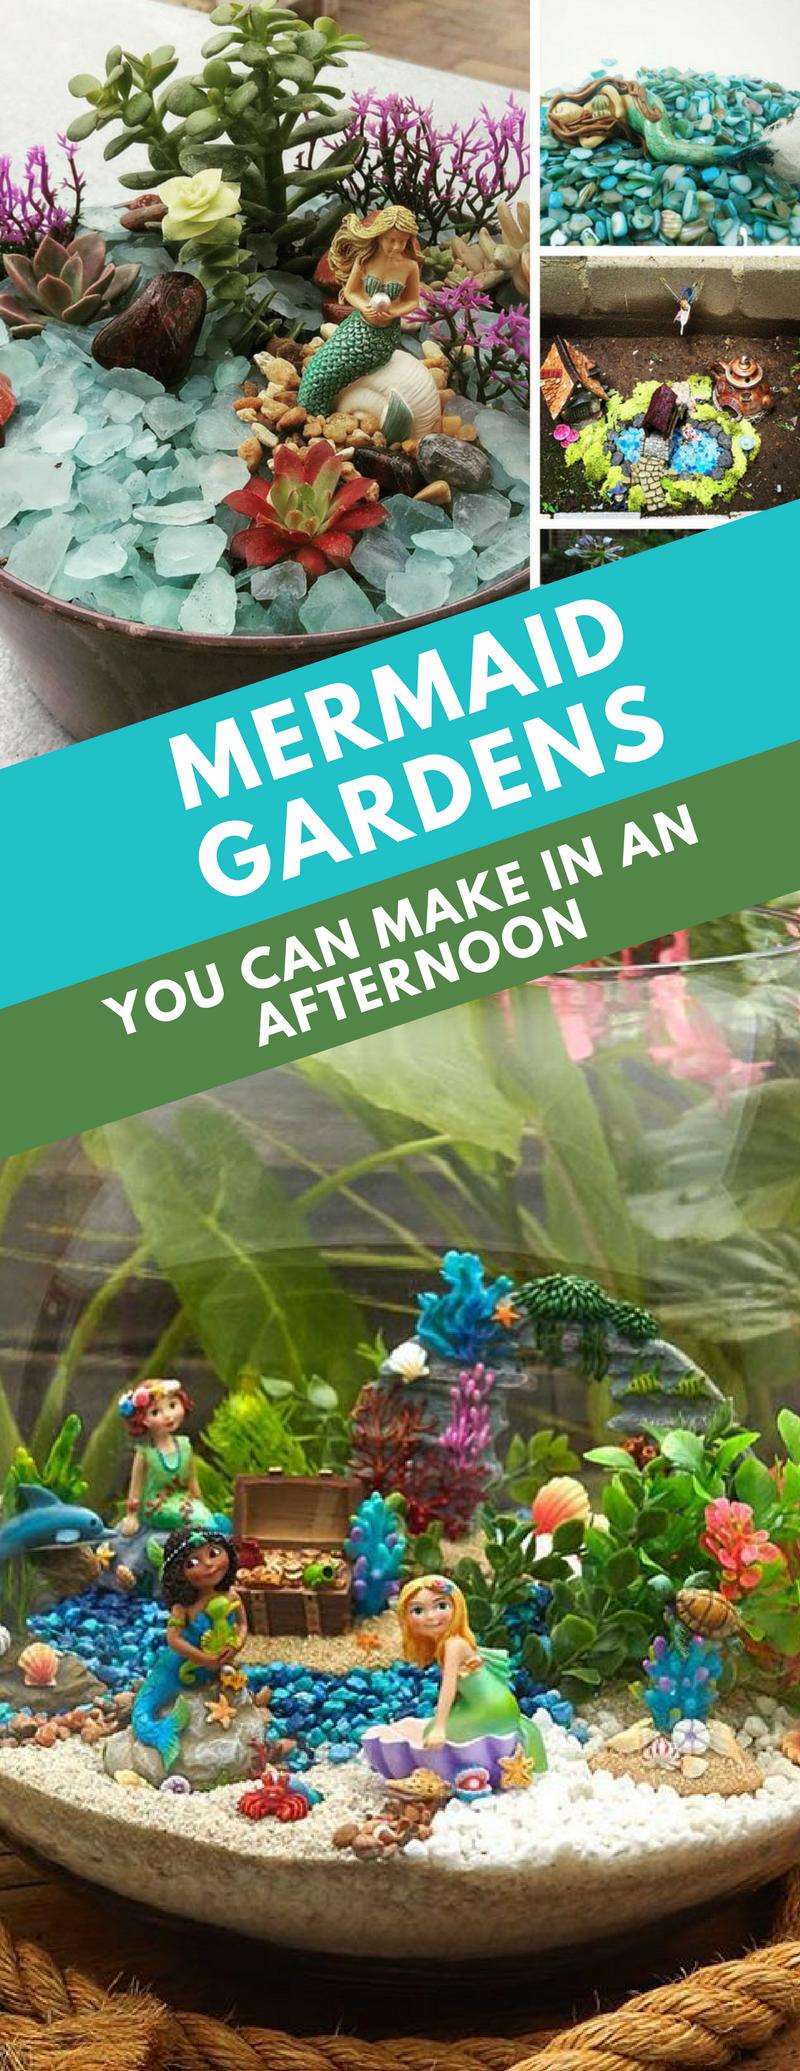 16 Magical Mermaid Gardens You Can Make